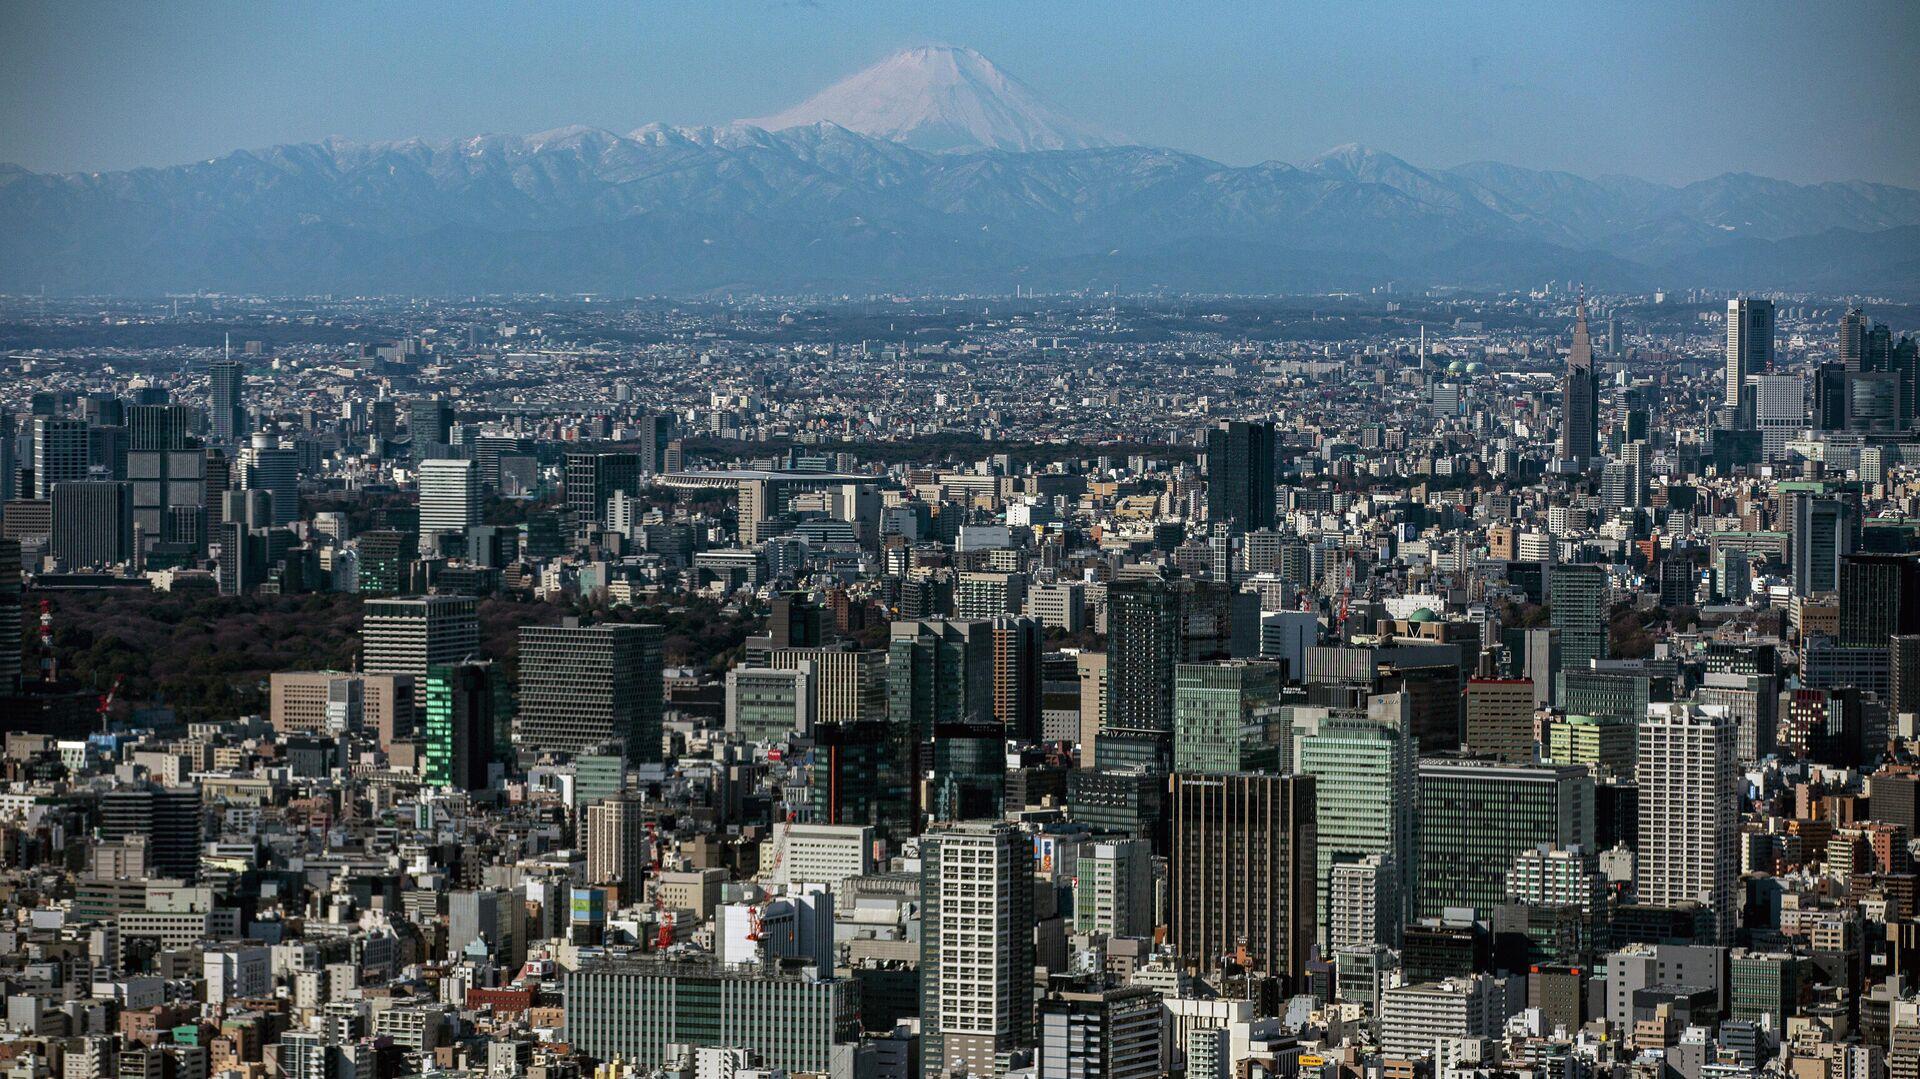 Панорама Токио - РИА Новости, 1920, 24.09.2021